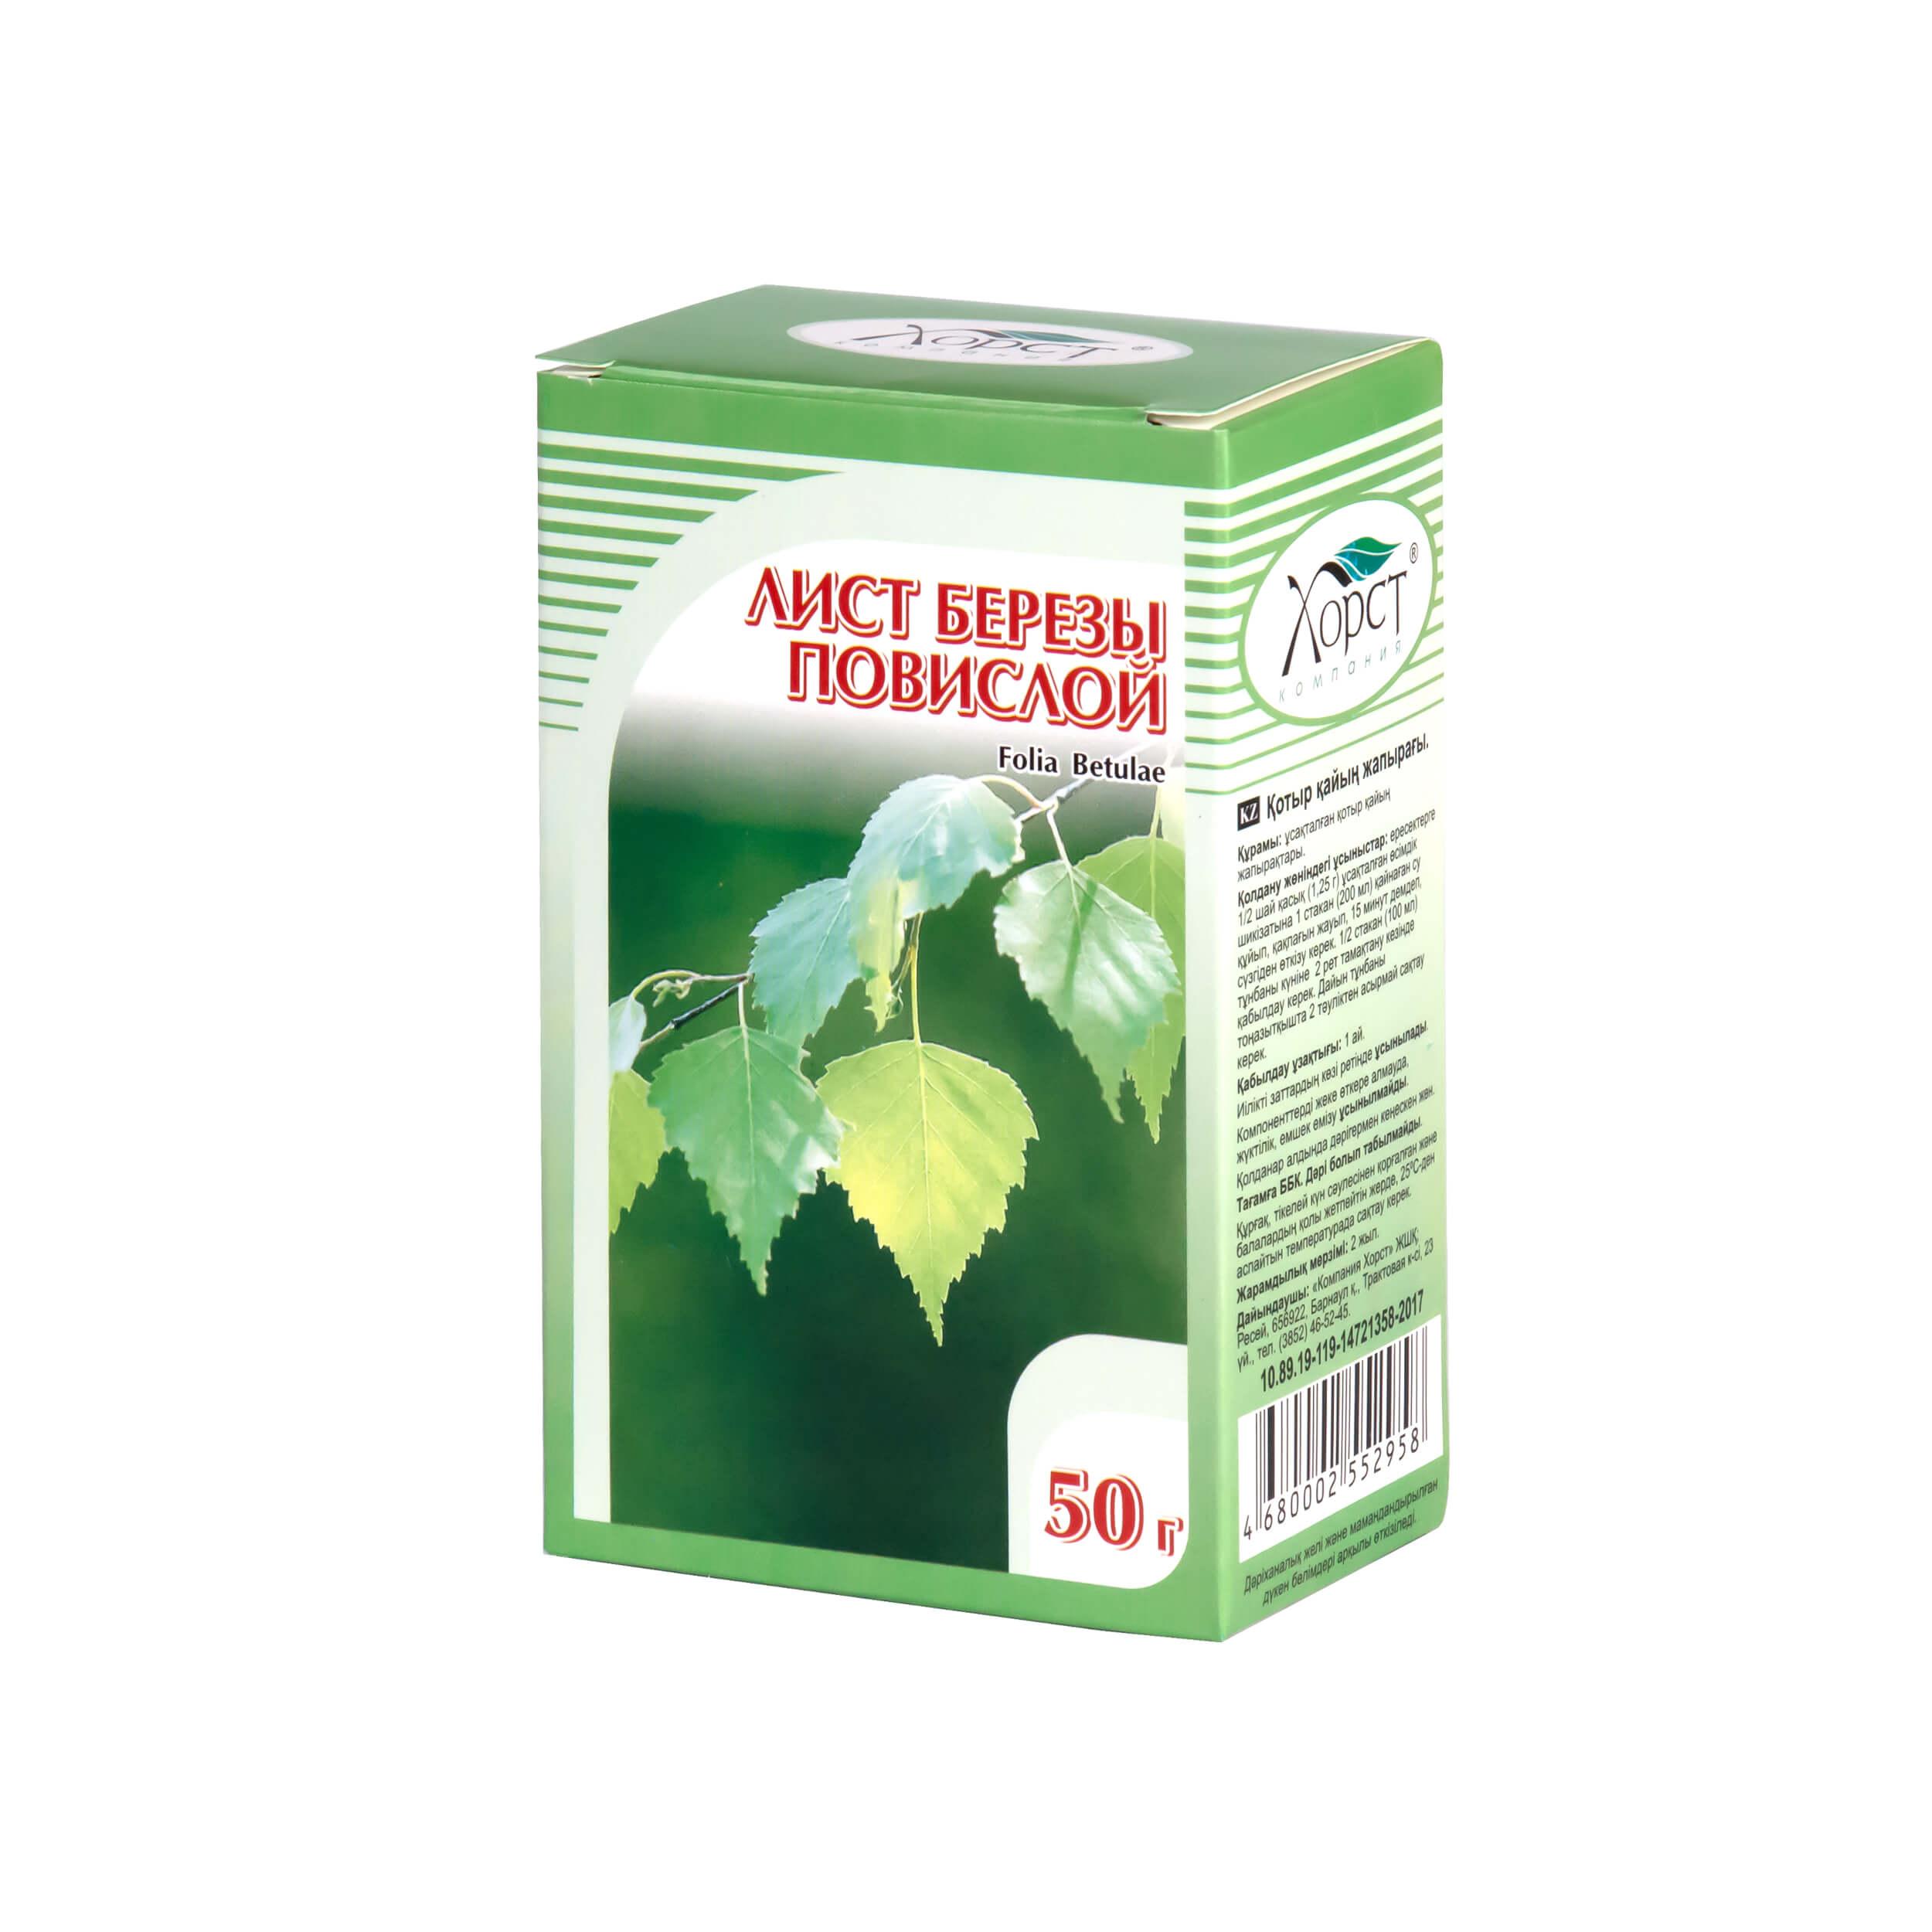 Береза повислая (листья, 50 грамм) фото